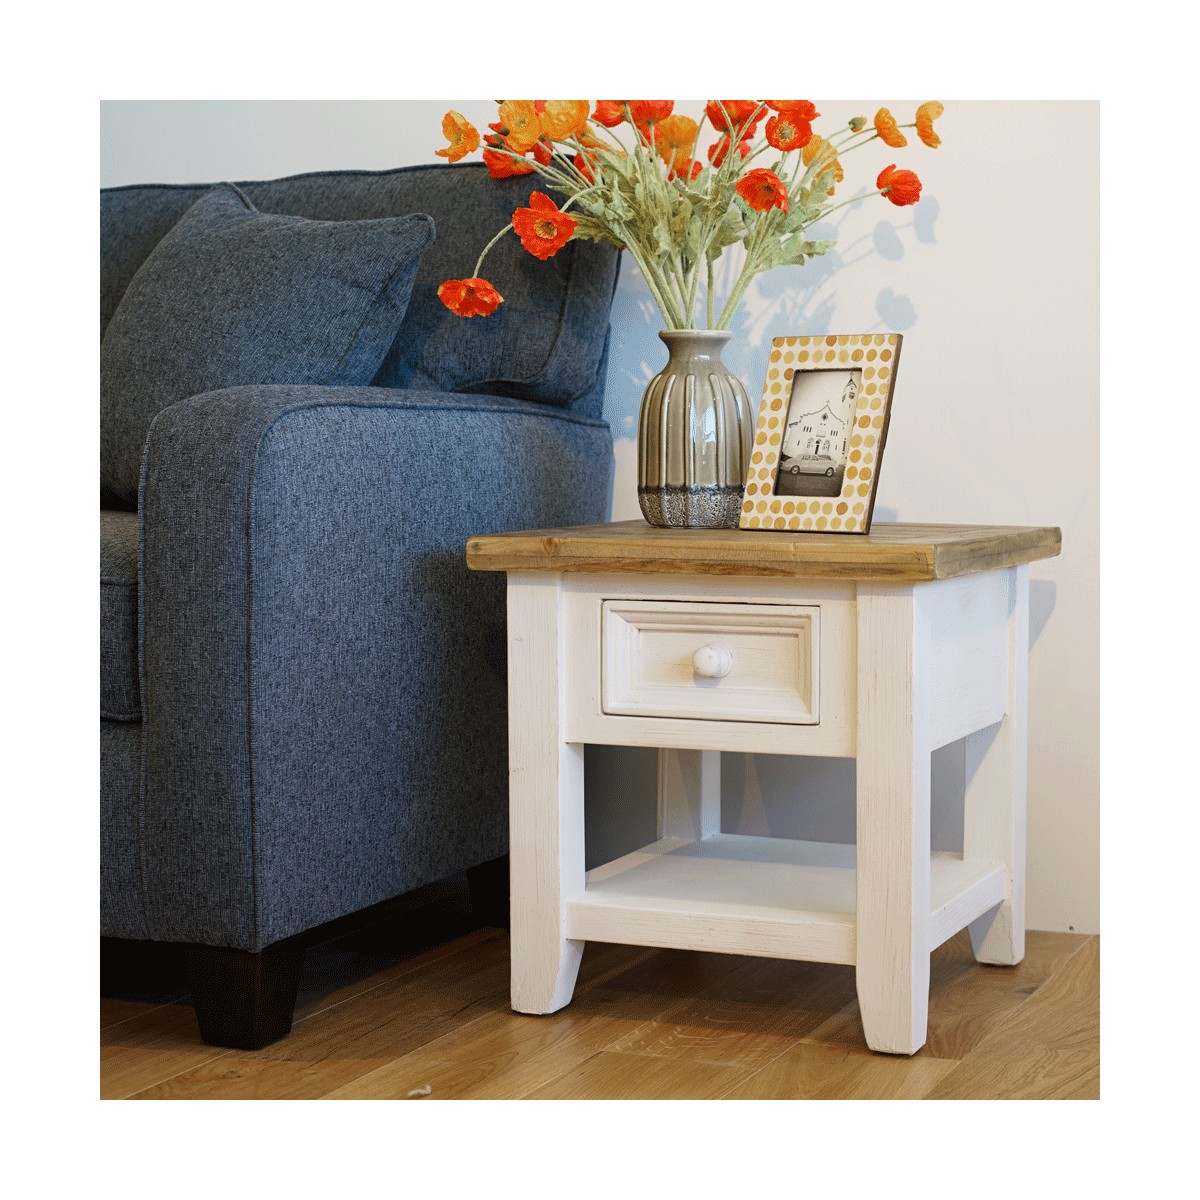 Table de chevet 1 Tiroir Bois Blanc 50x50x50cm